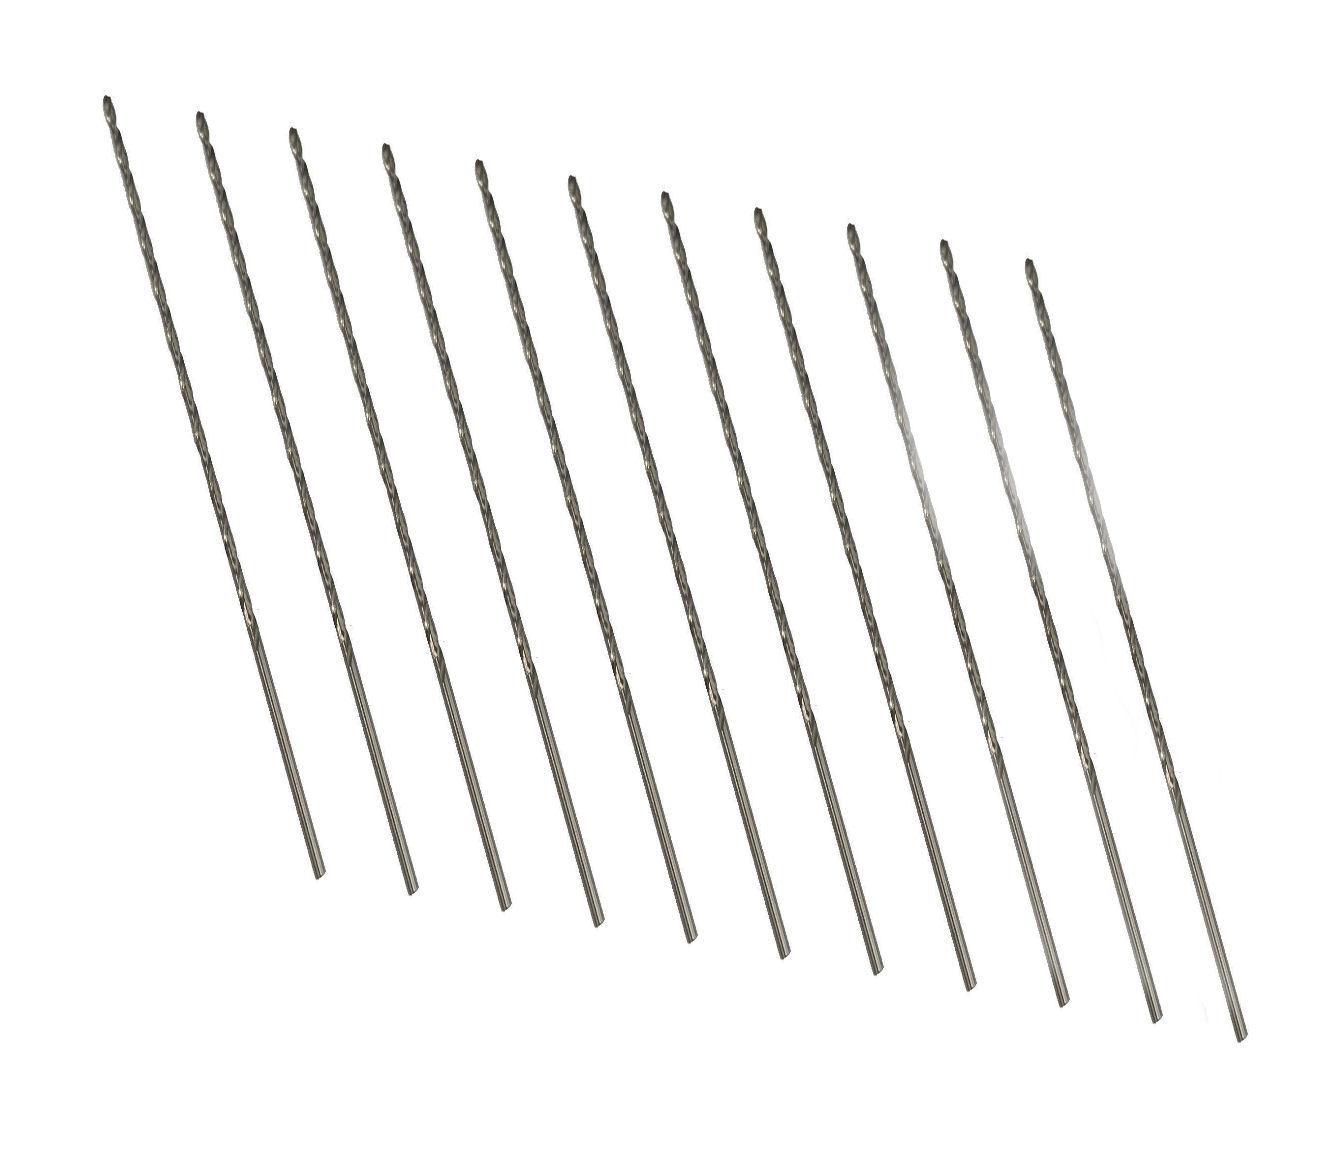 number 29 drill bit diameter